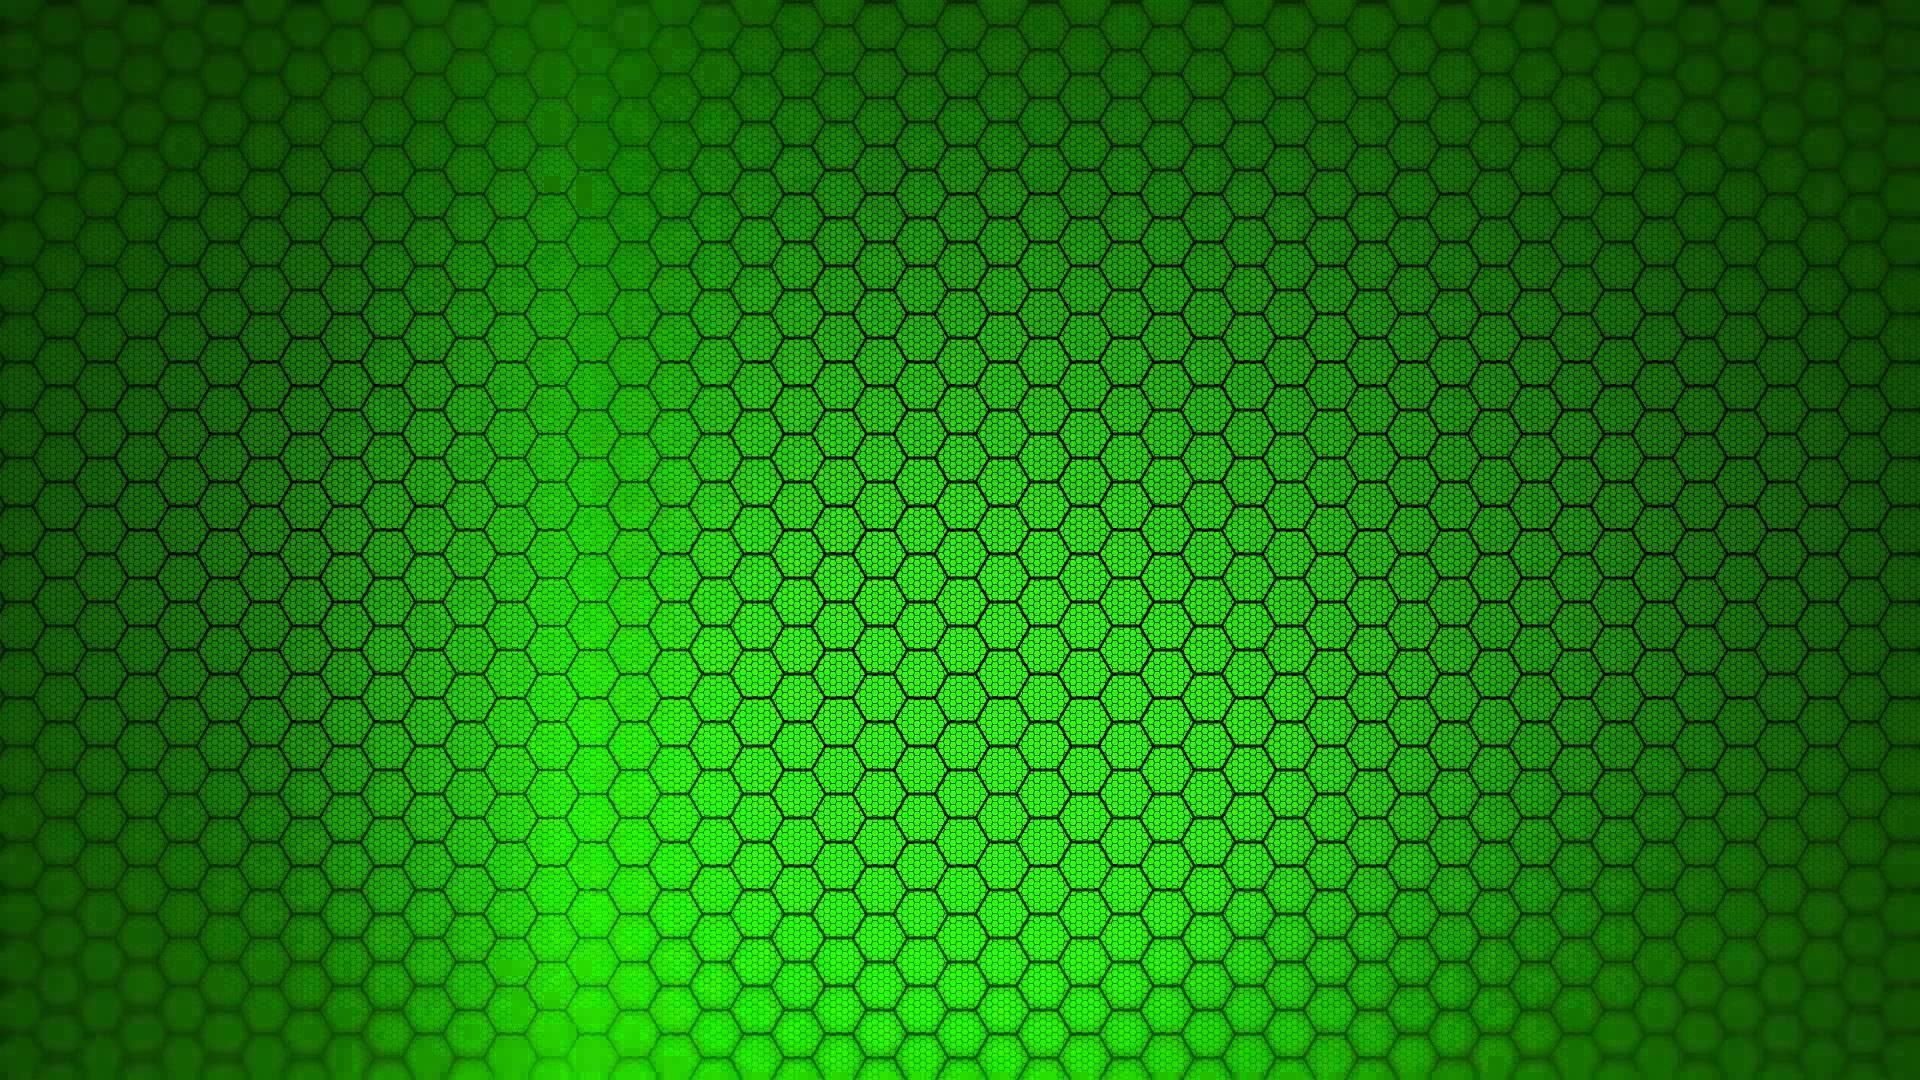 3d Wallpapers For Spring Green Wallpapers Hd Pixelstalk Net